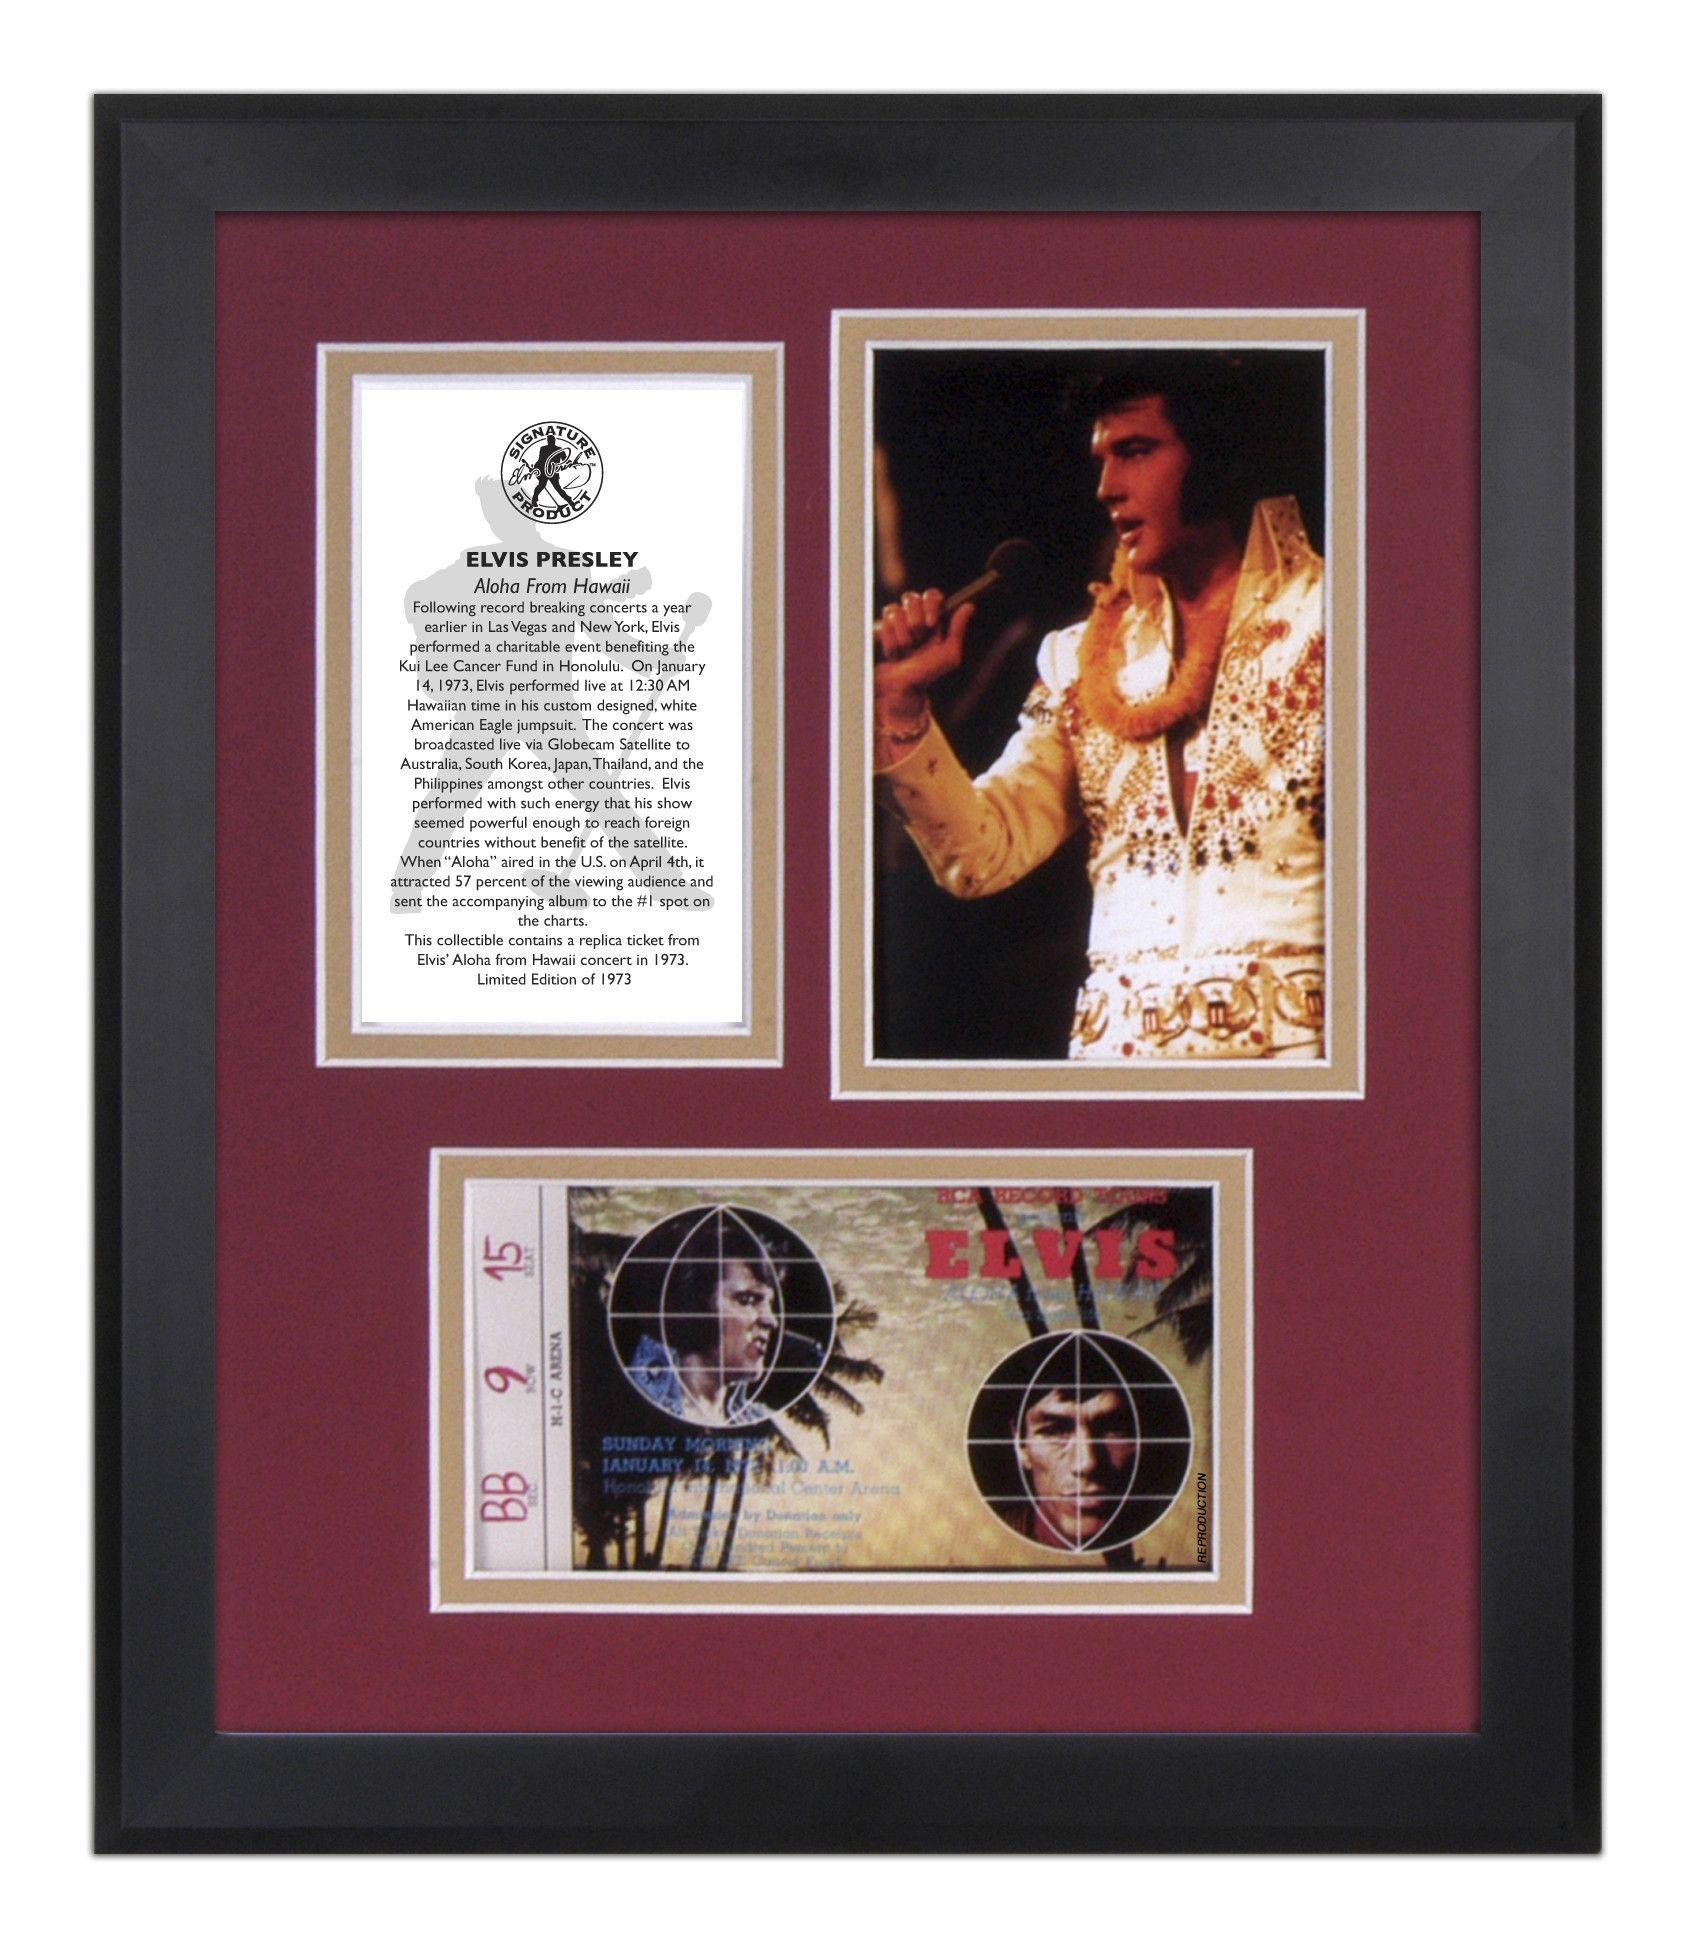 Elvis presley then amp now 25th anniversary collector s edition ebay - Elvis Presley Aloha From Hawaii 35th Anniversary Framed Memorabilia